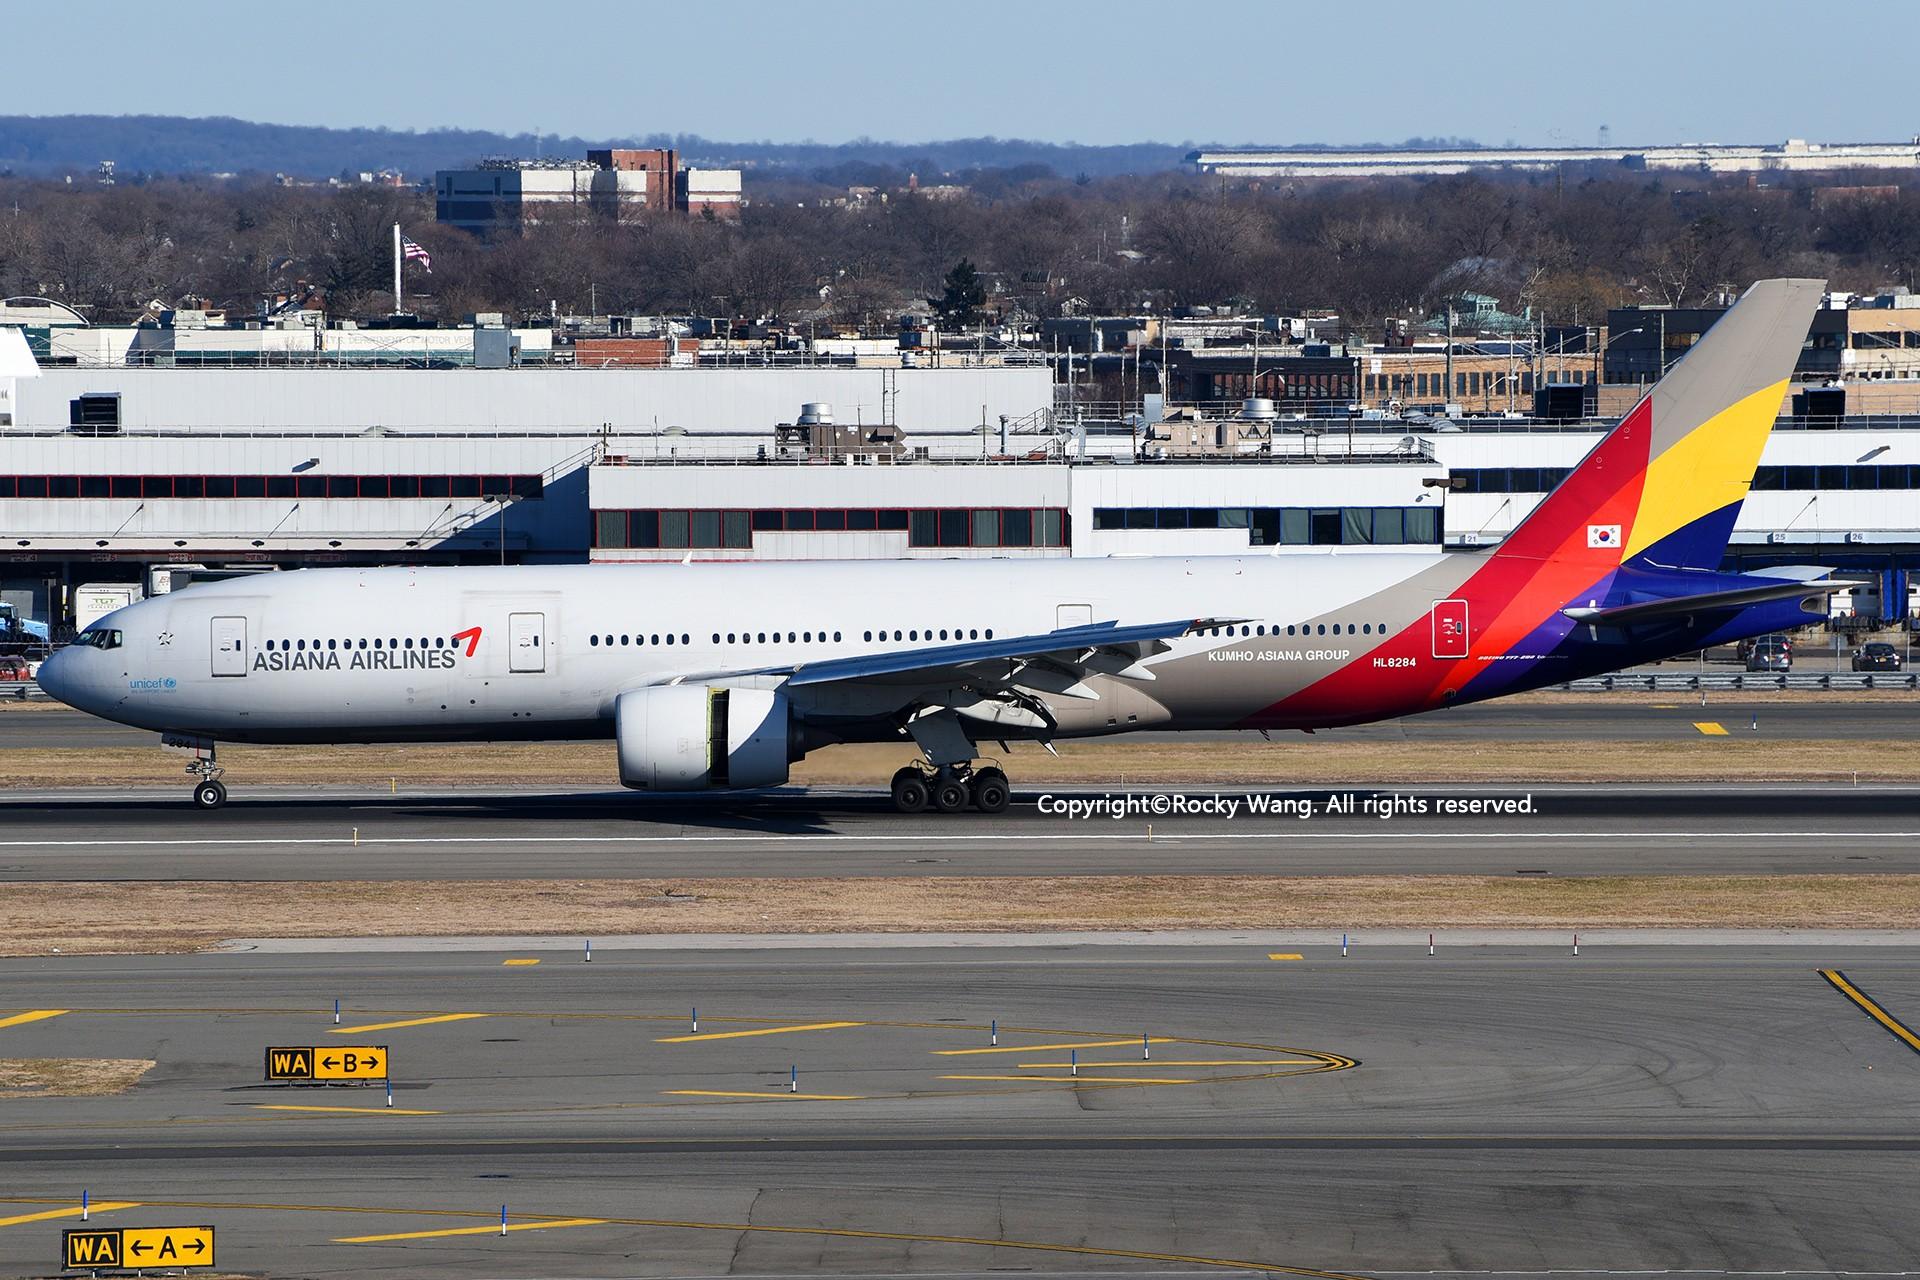 Re:[原创]KJFK 30图 BOEING 777-28E(ER) HL8284 New York John F. Kennedy Int'l Airport